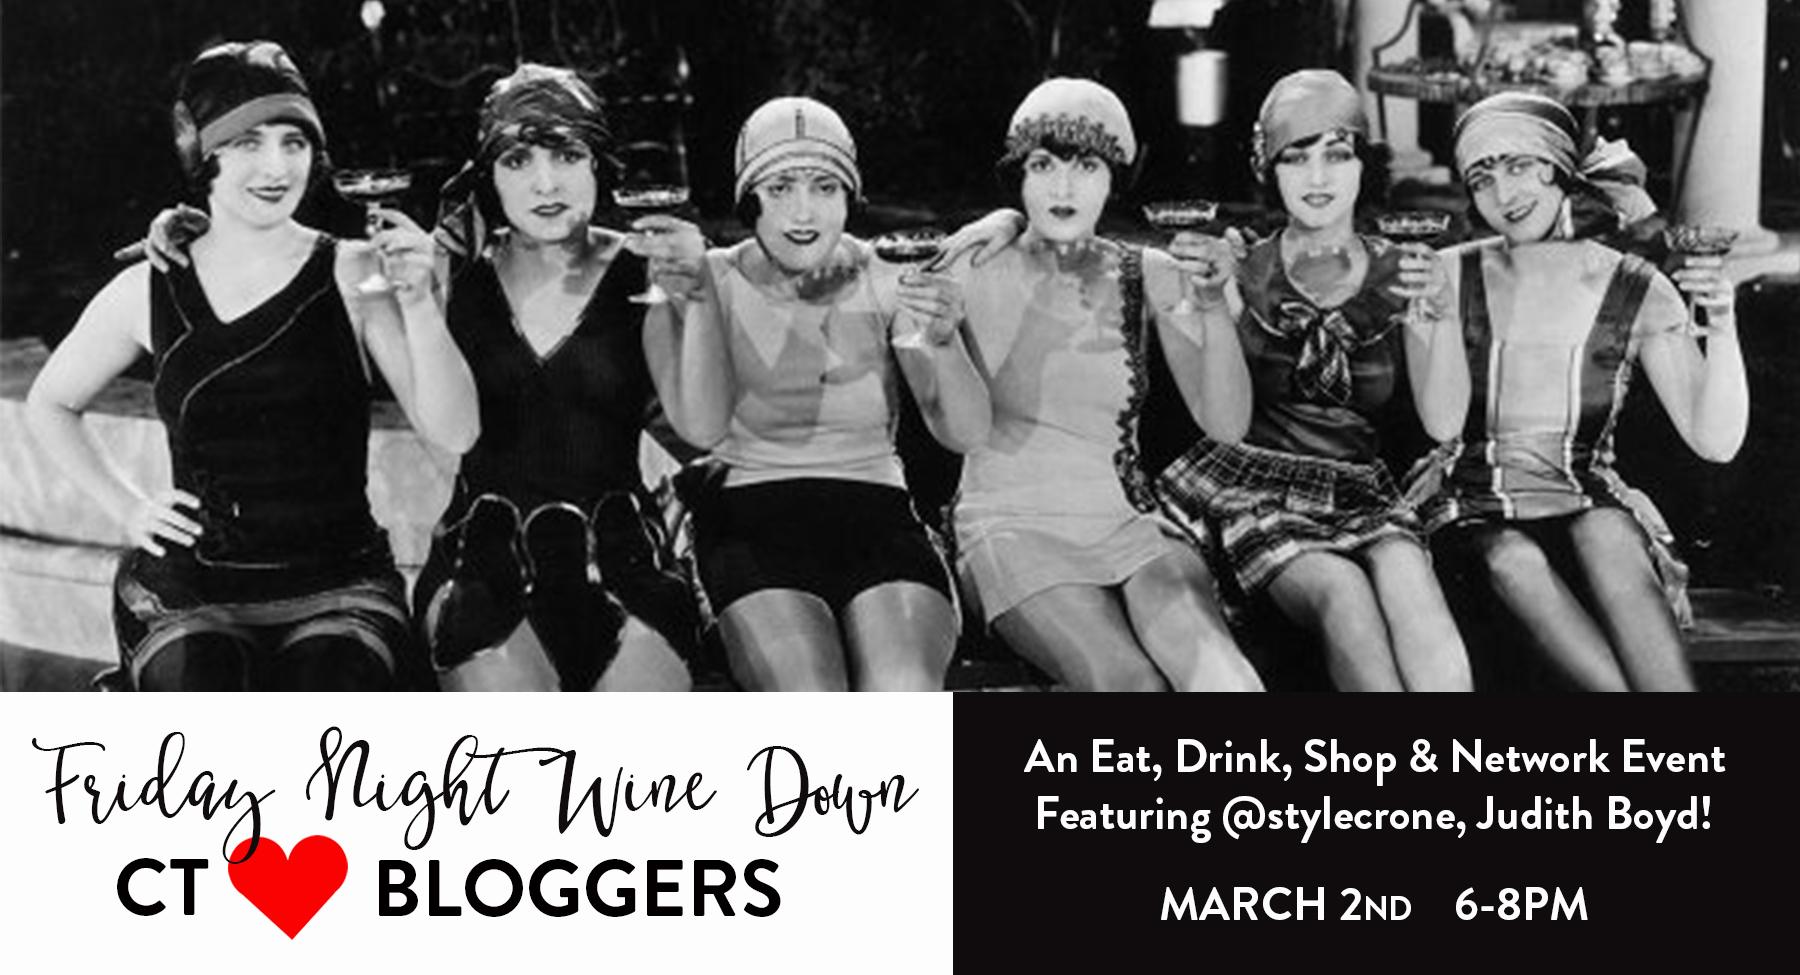 blogger-event-fb-1.jpg